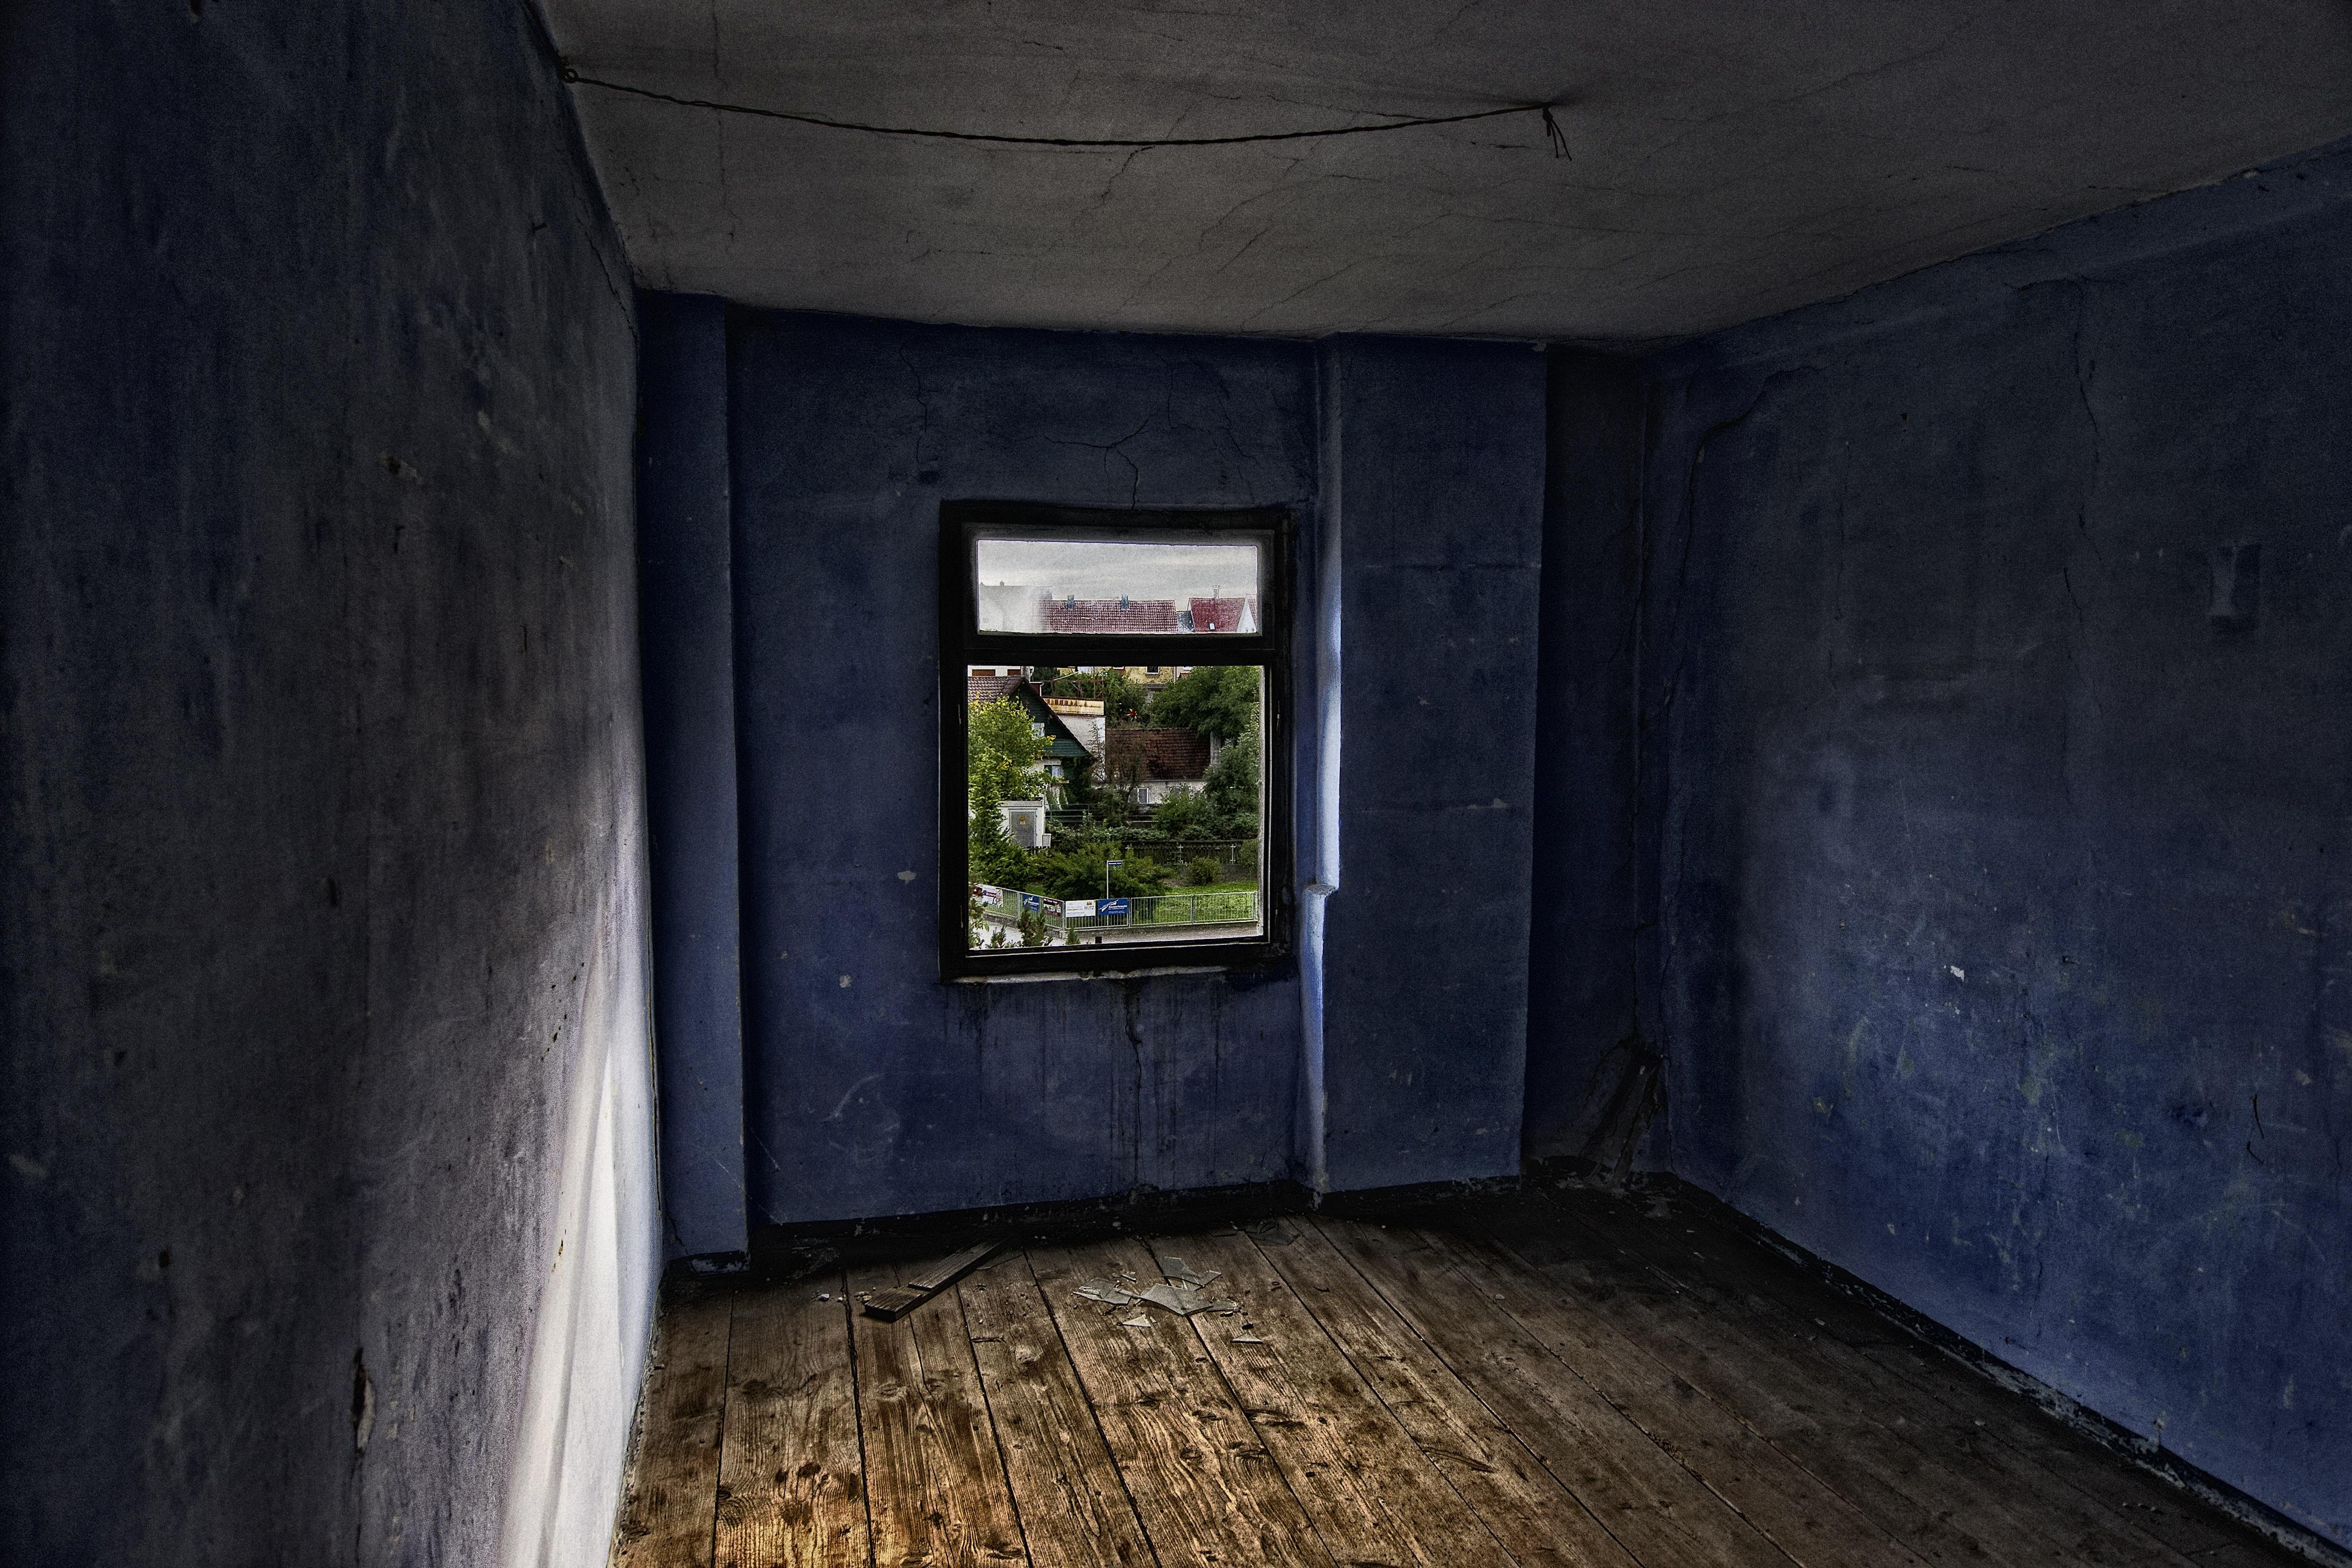 Old Dark Room Background